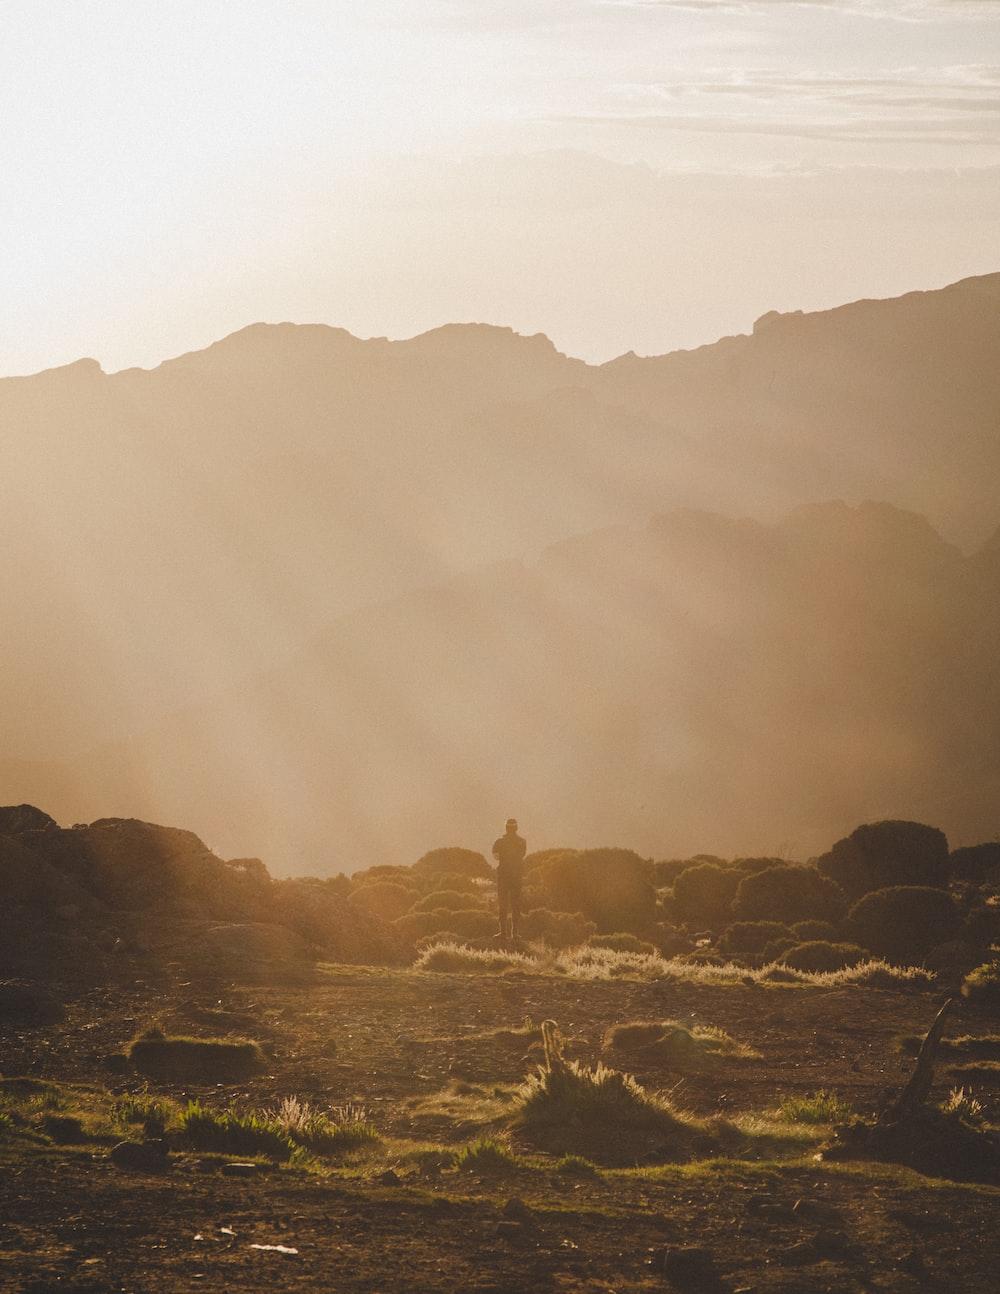 silhouette of man under sun rays